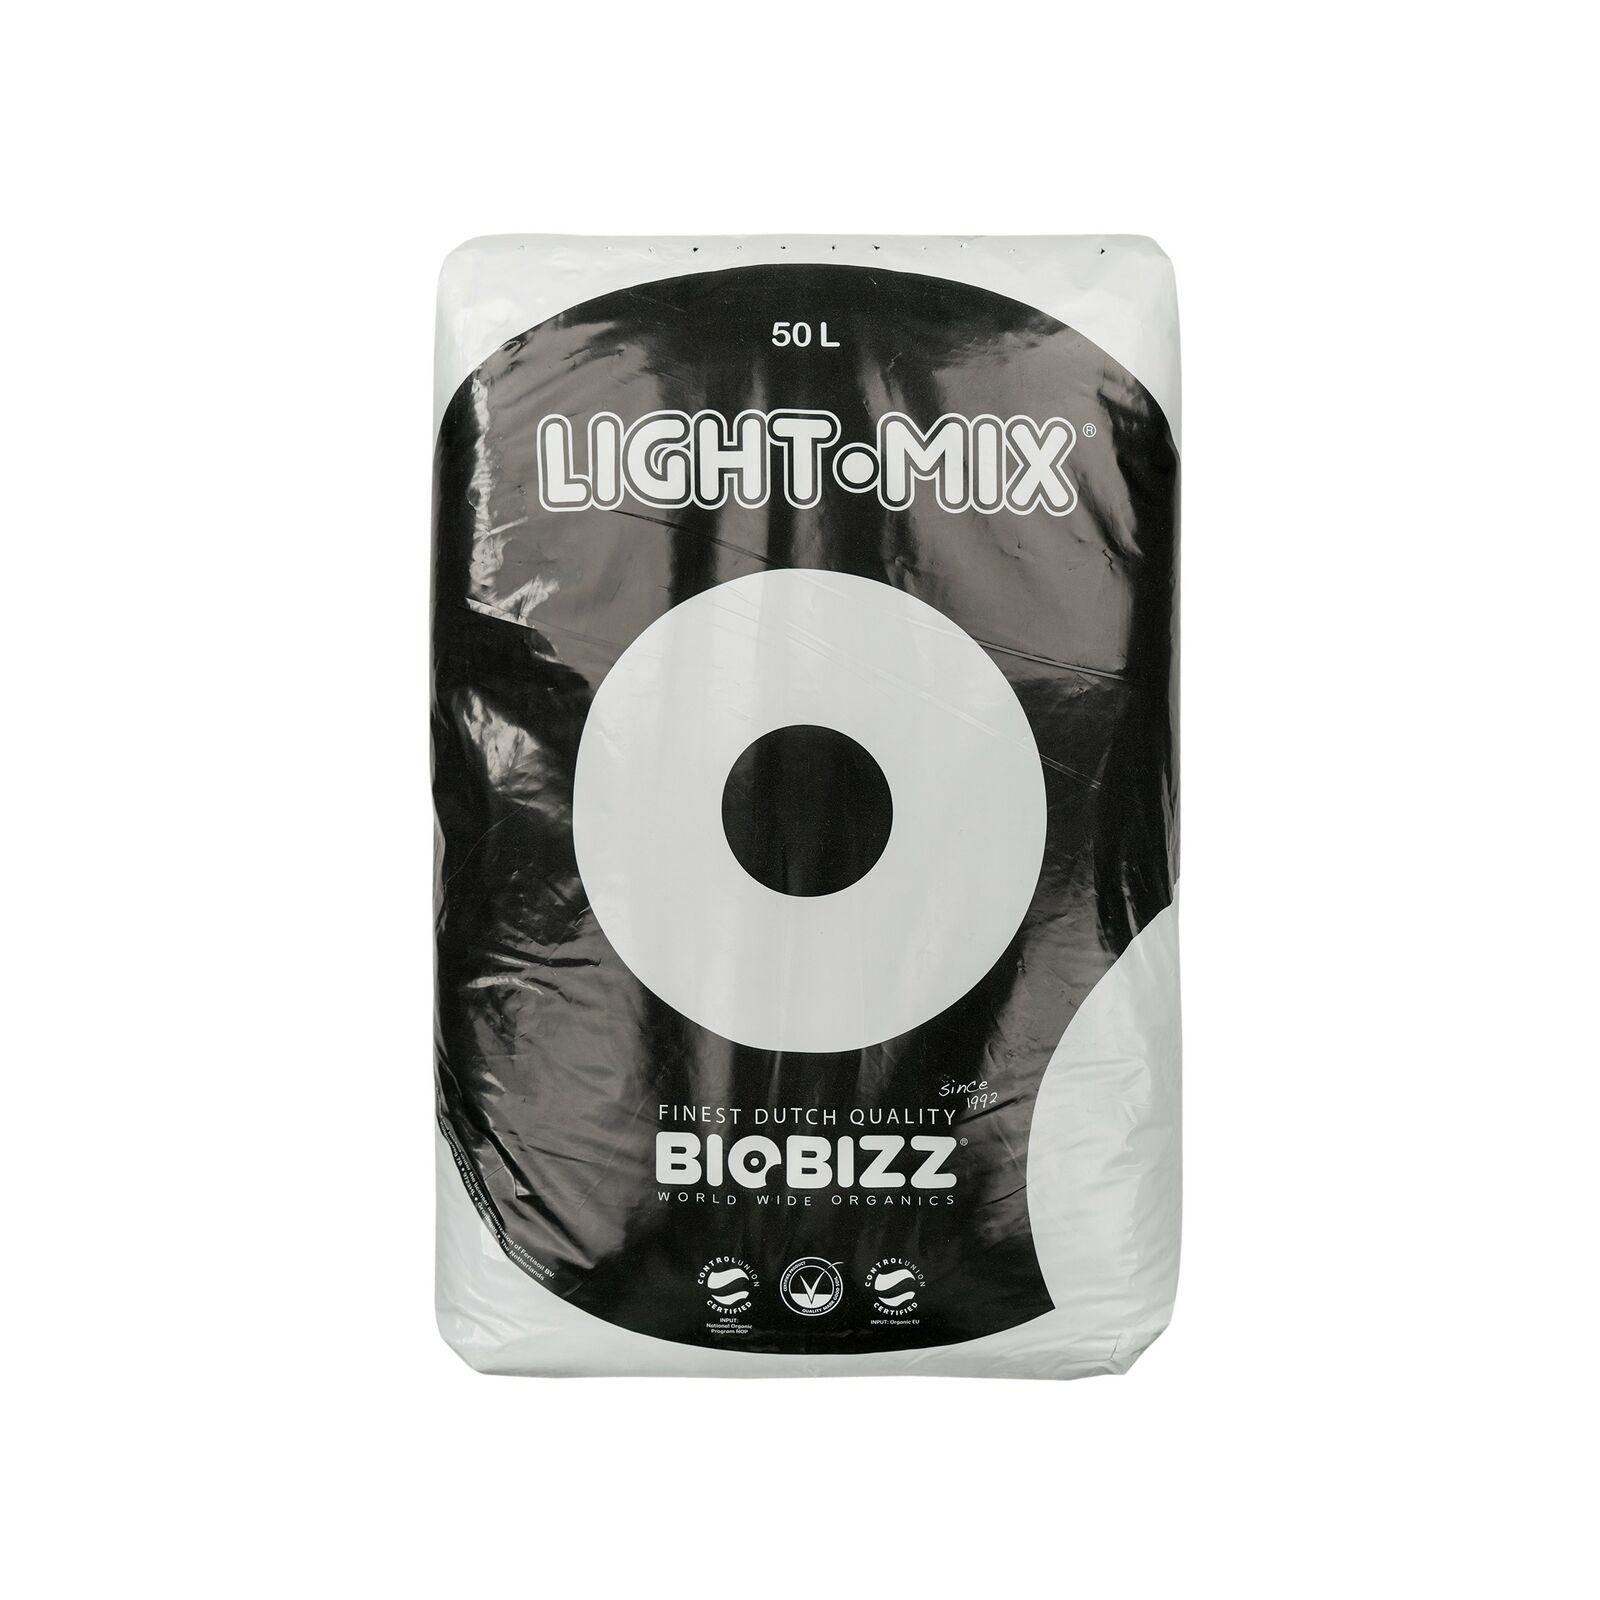 (0,30 /L) BIOBIZZ LIGHT MIX 50L Potting with Perlite Grow Flowers Earth